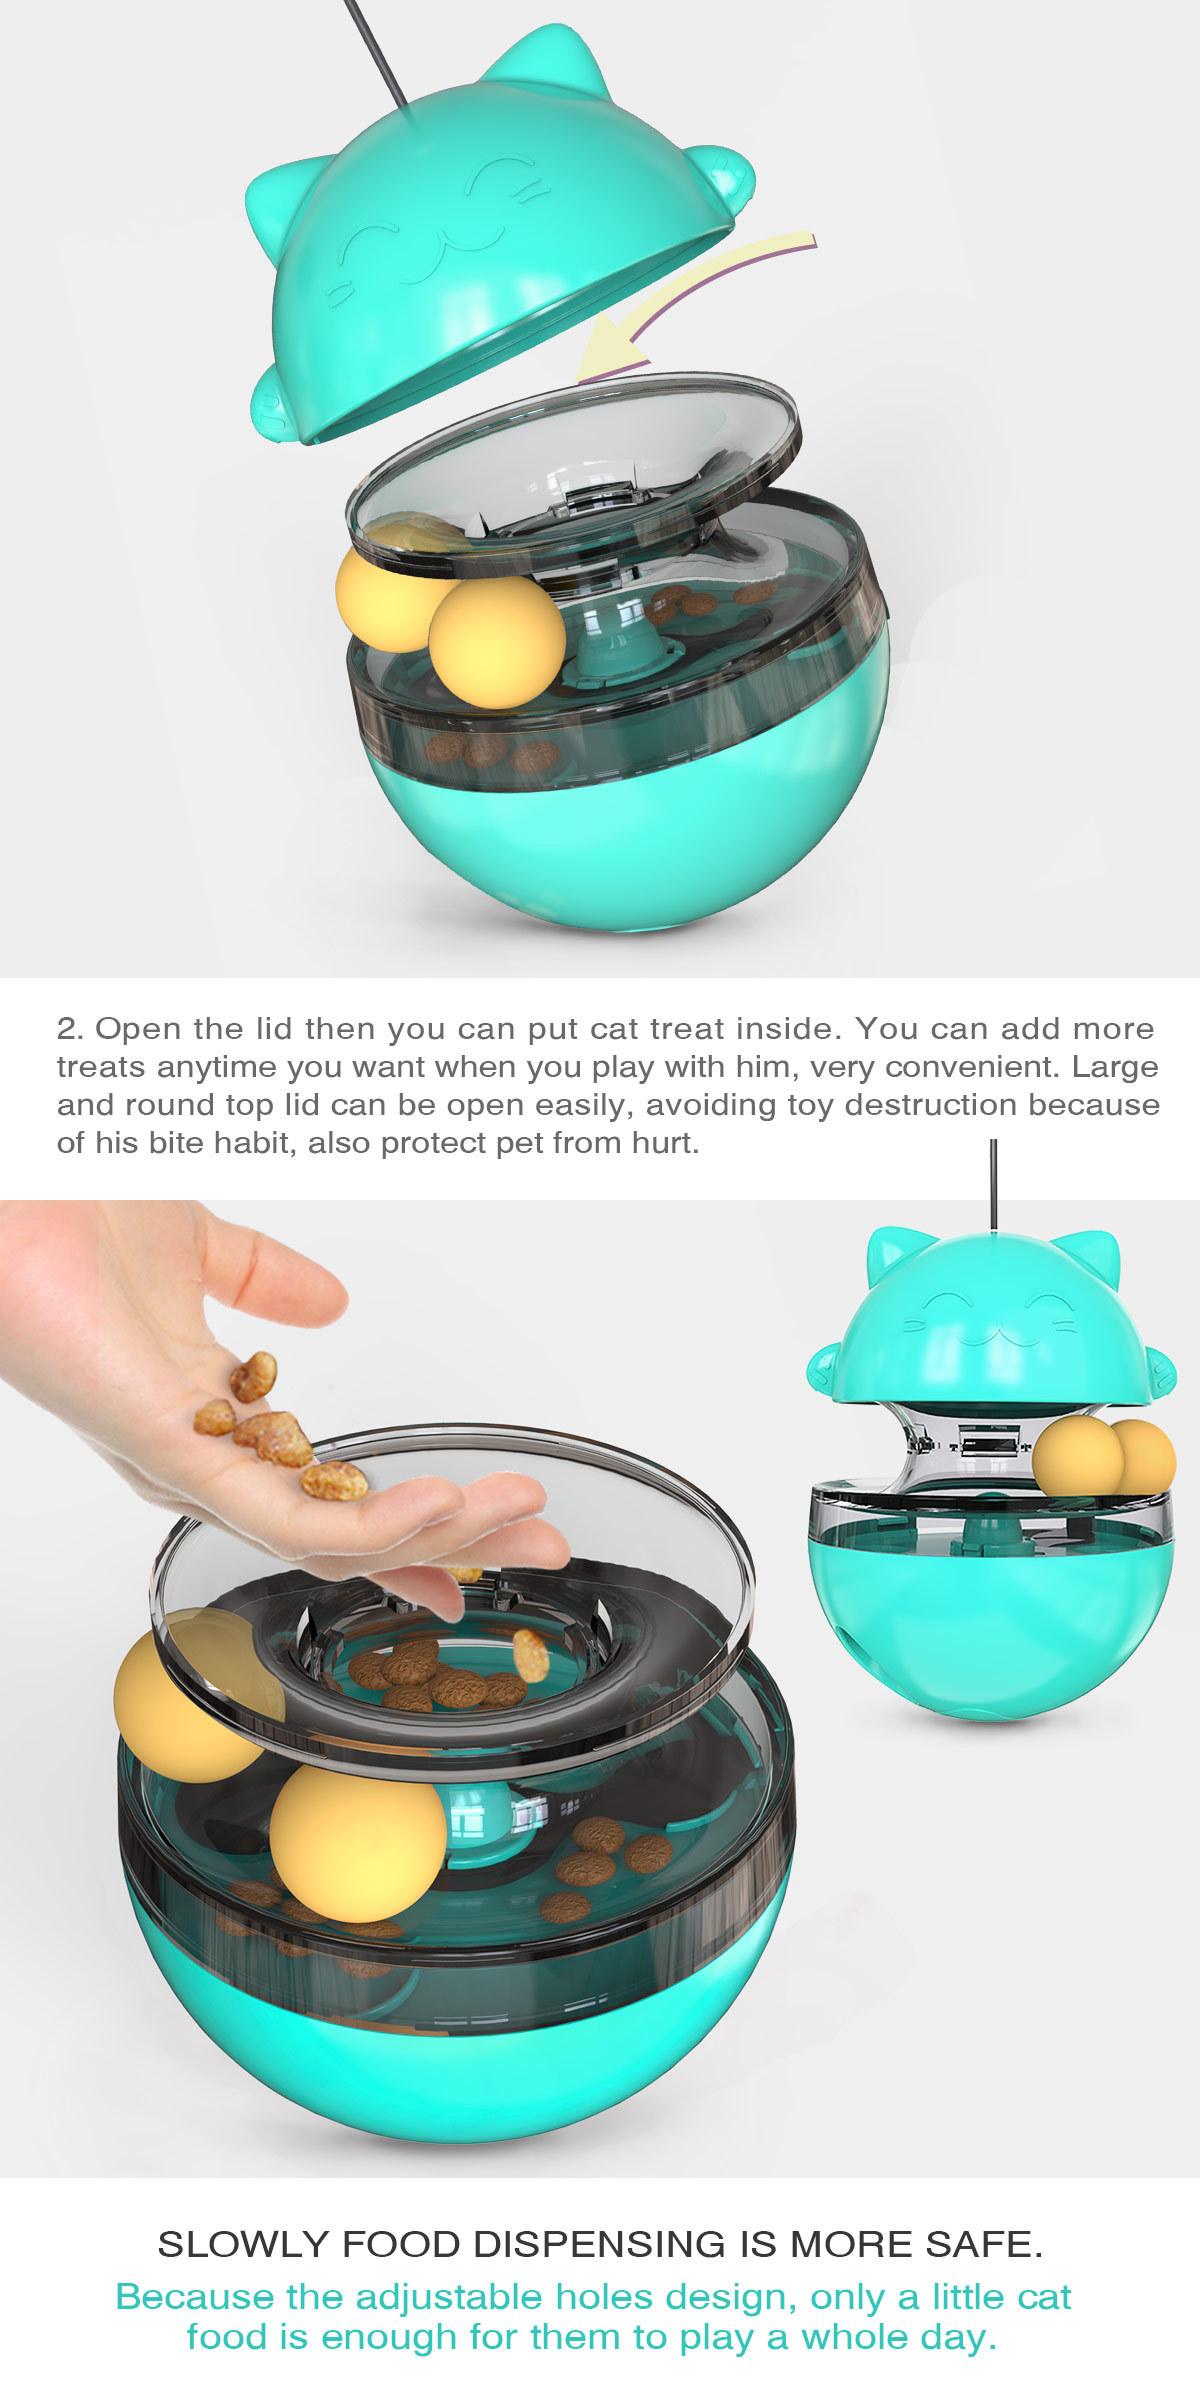 Pet Supplies Shake Cat Toy Teasing Cat Stick Teasing Artifact Track Ball Does Not Spill Food Ball MOQ 30 PCS 0